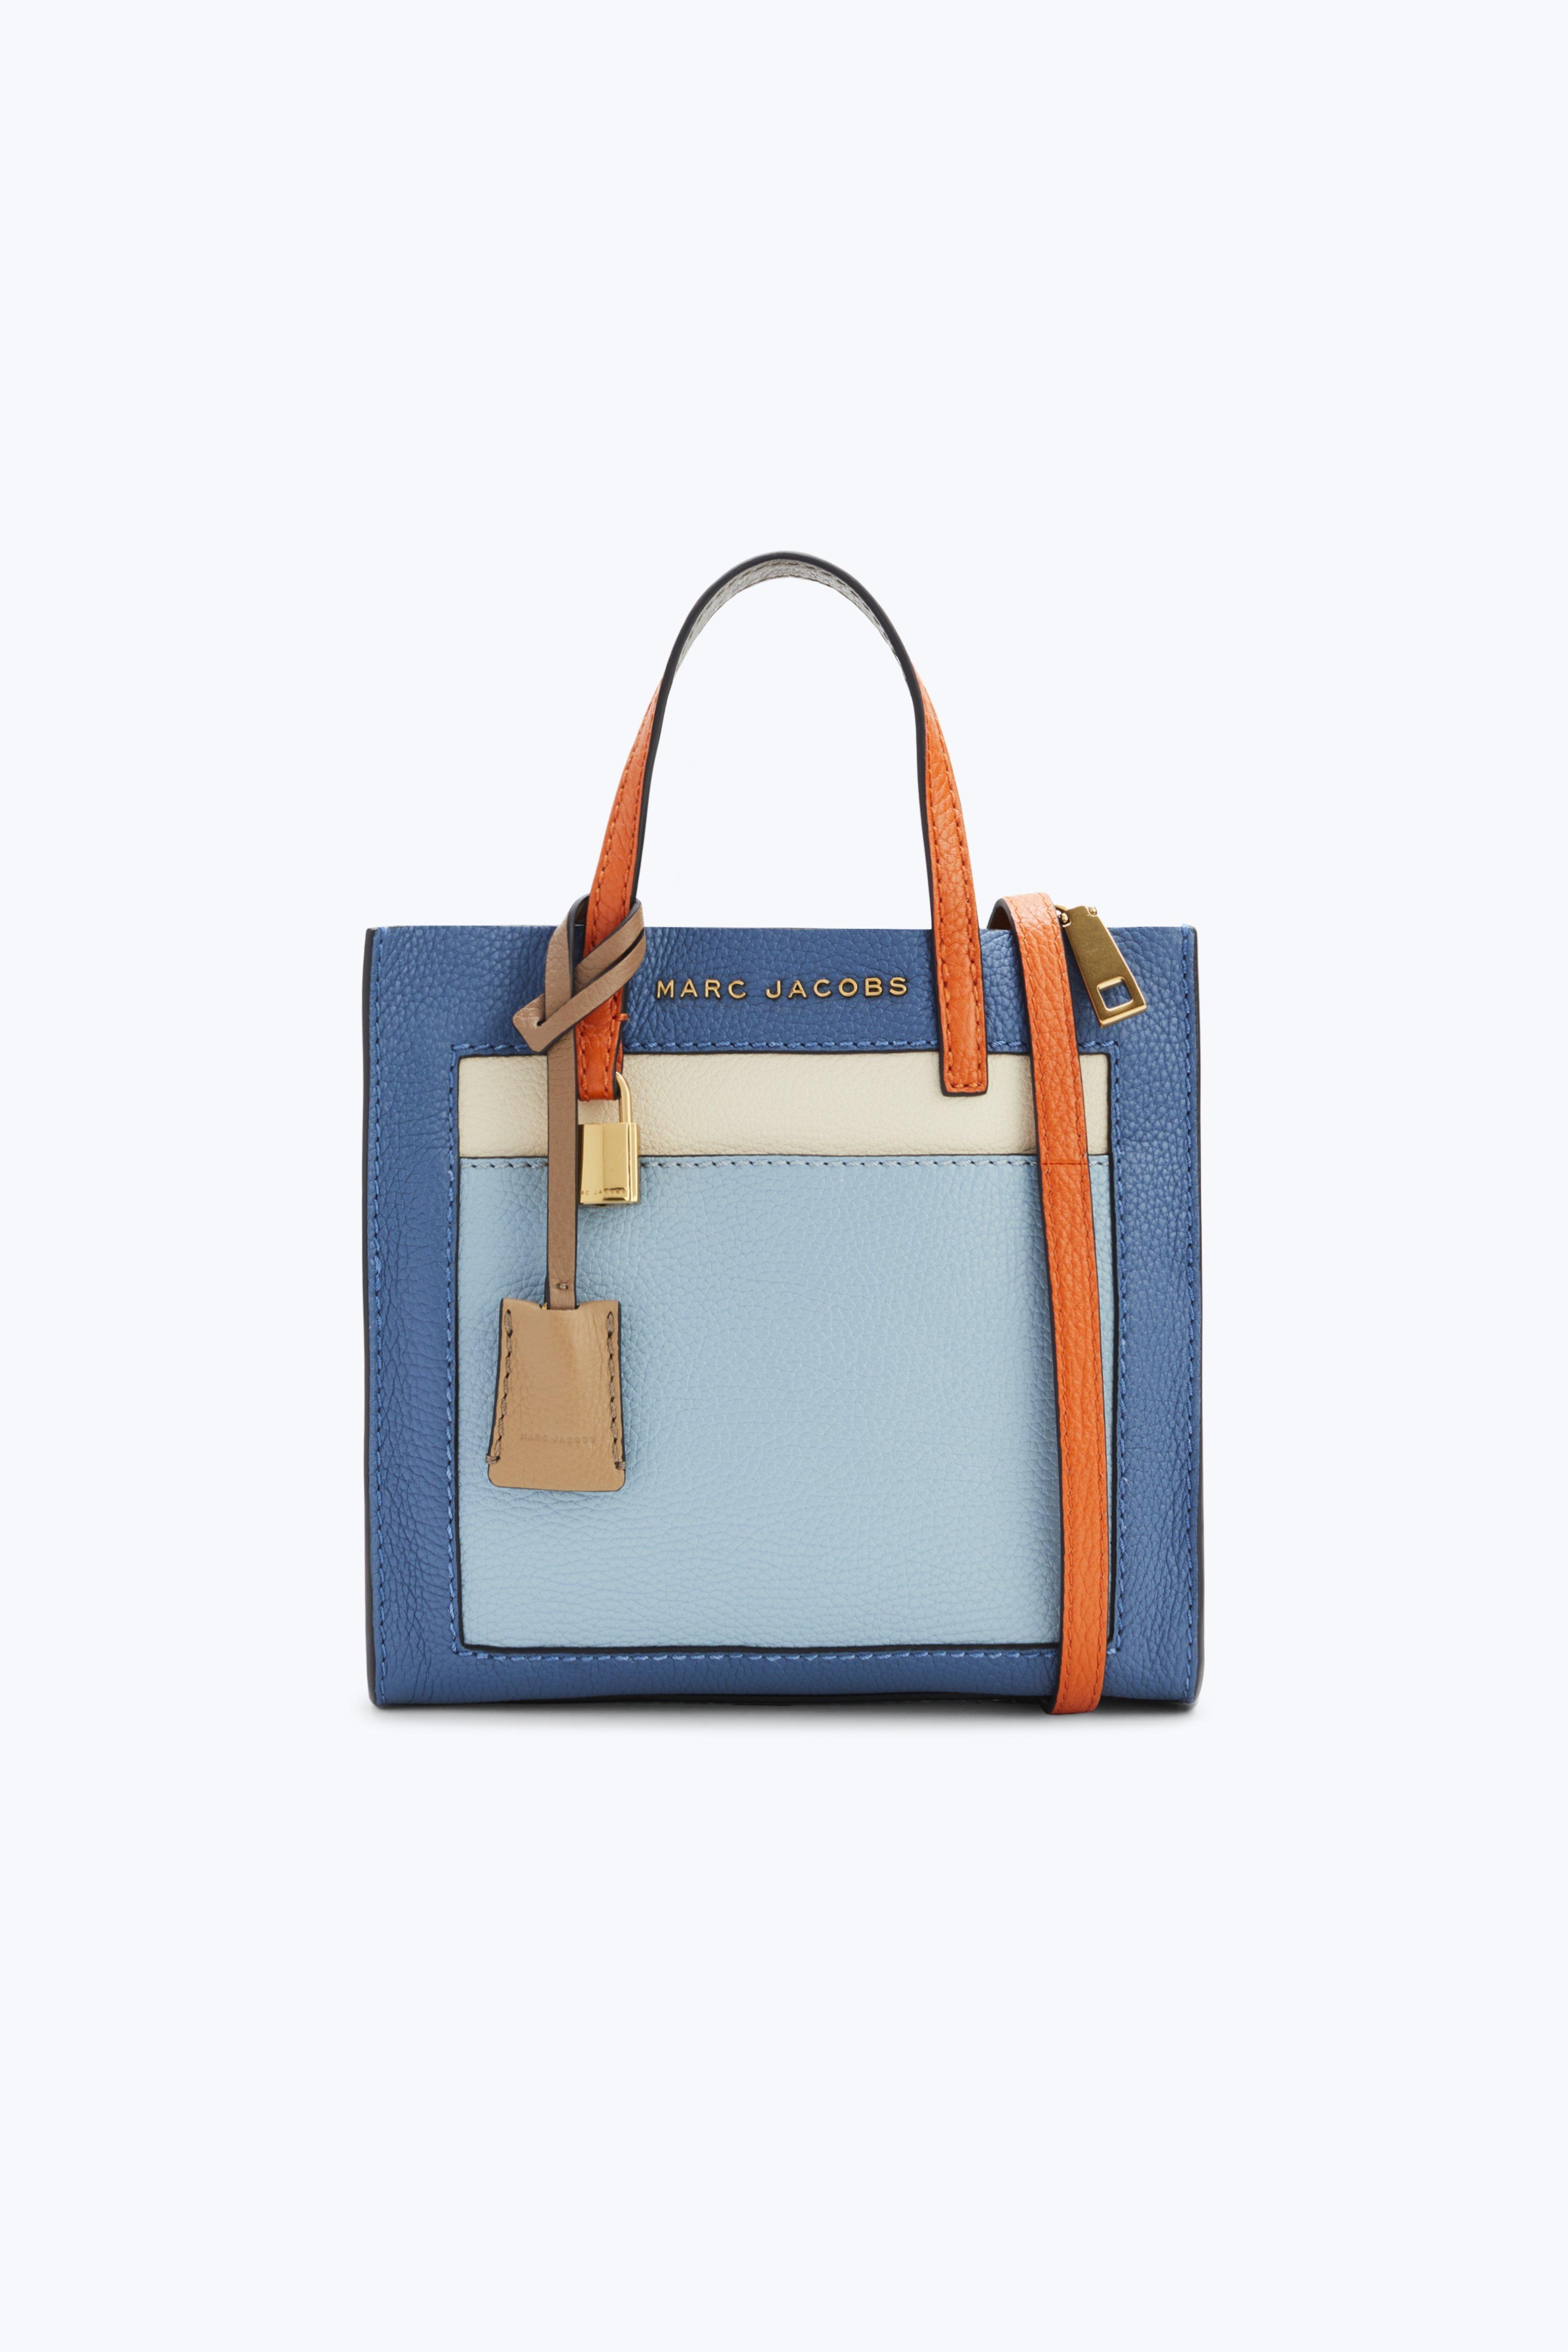 Marc Jacobs The Colorblocked Mini Grind Bag In Vintage Blue Multi